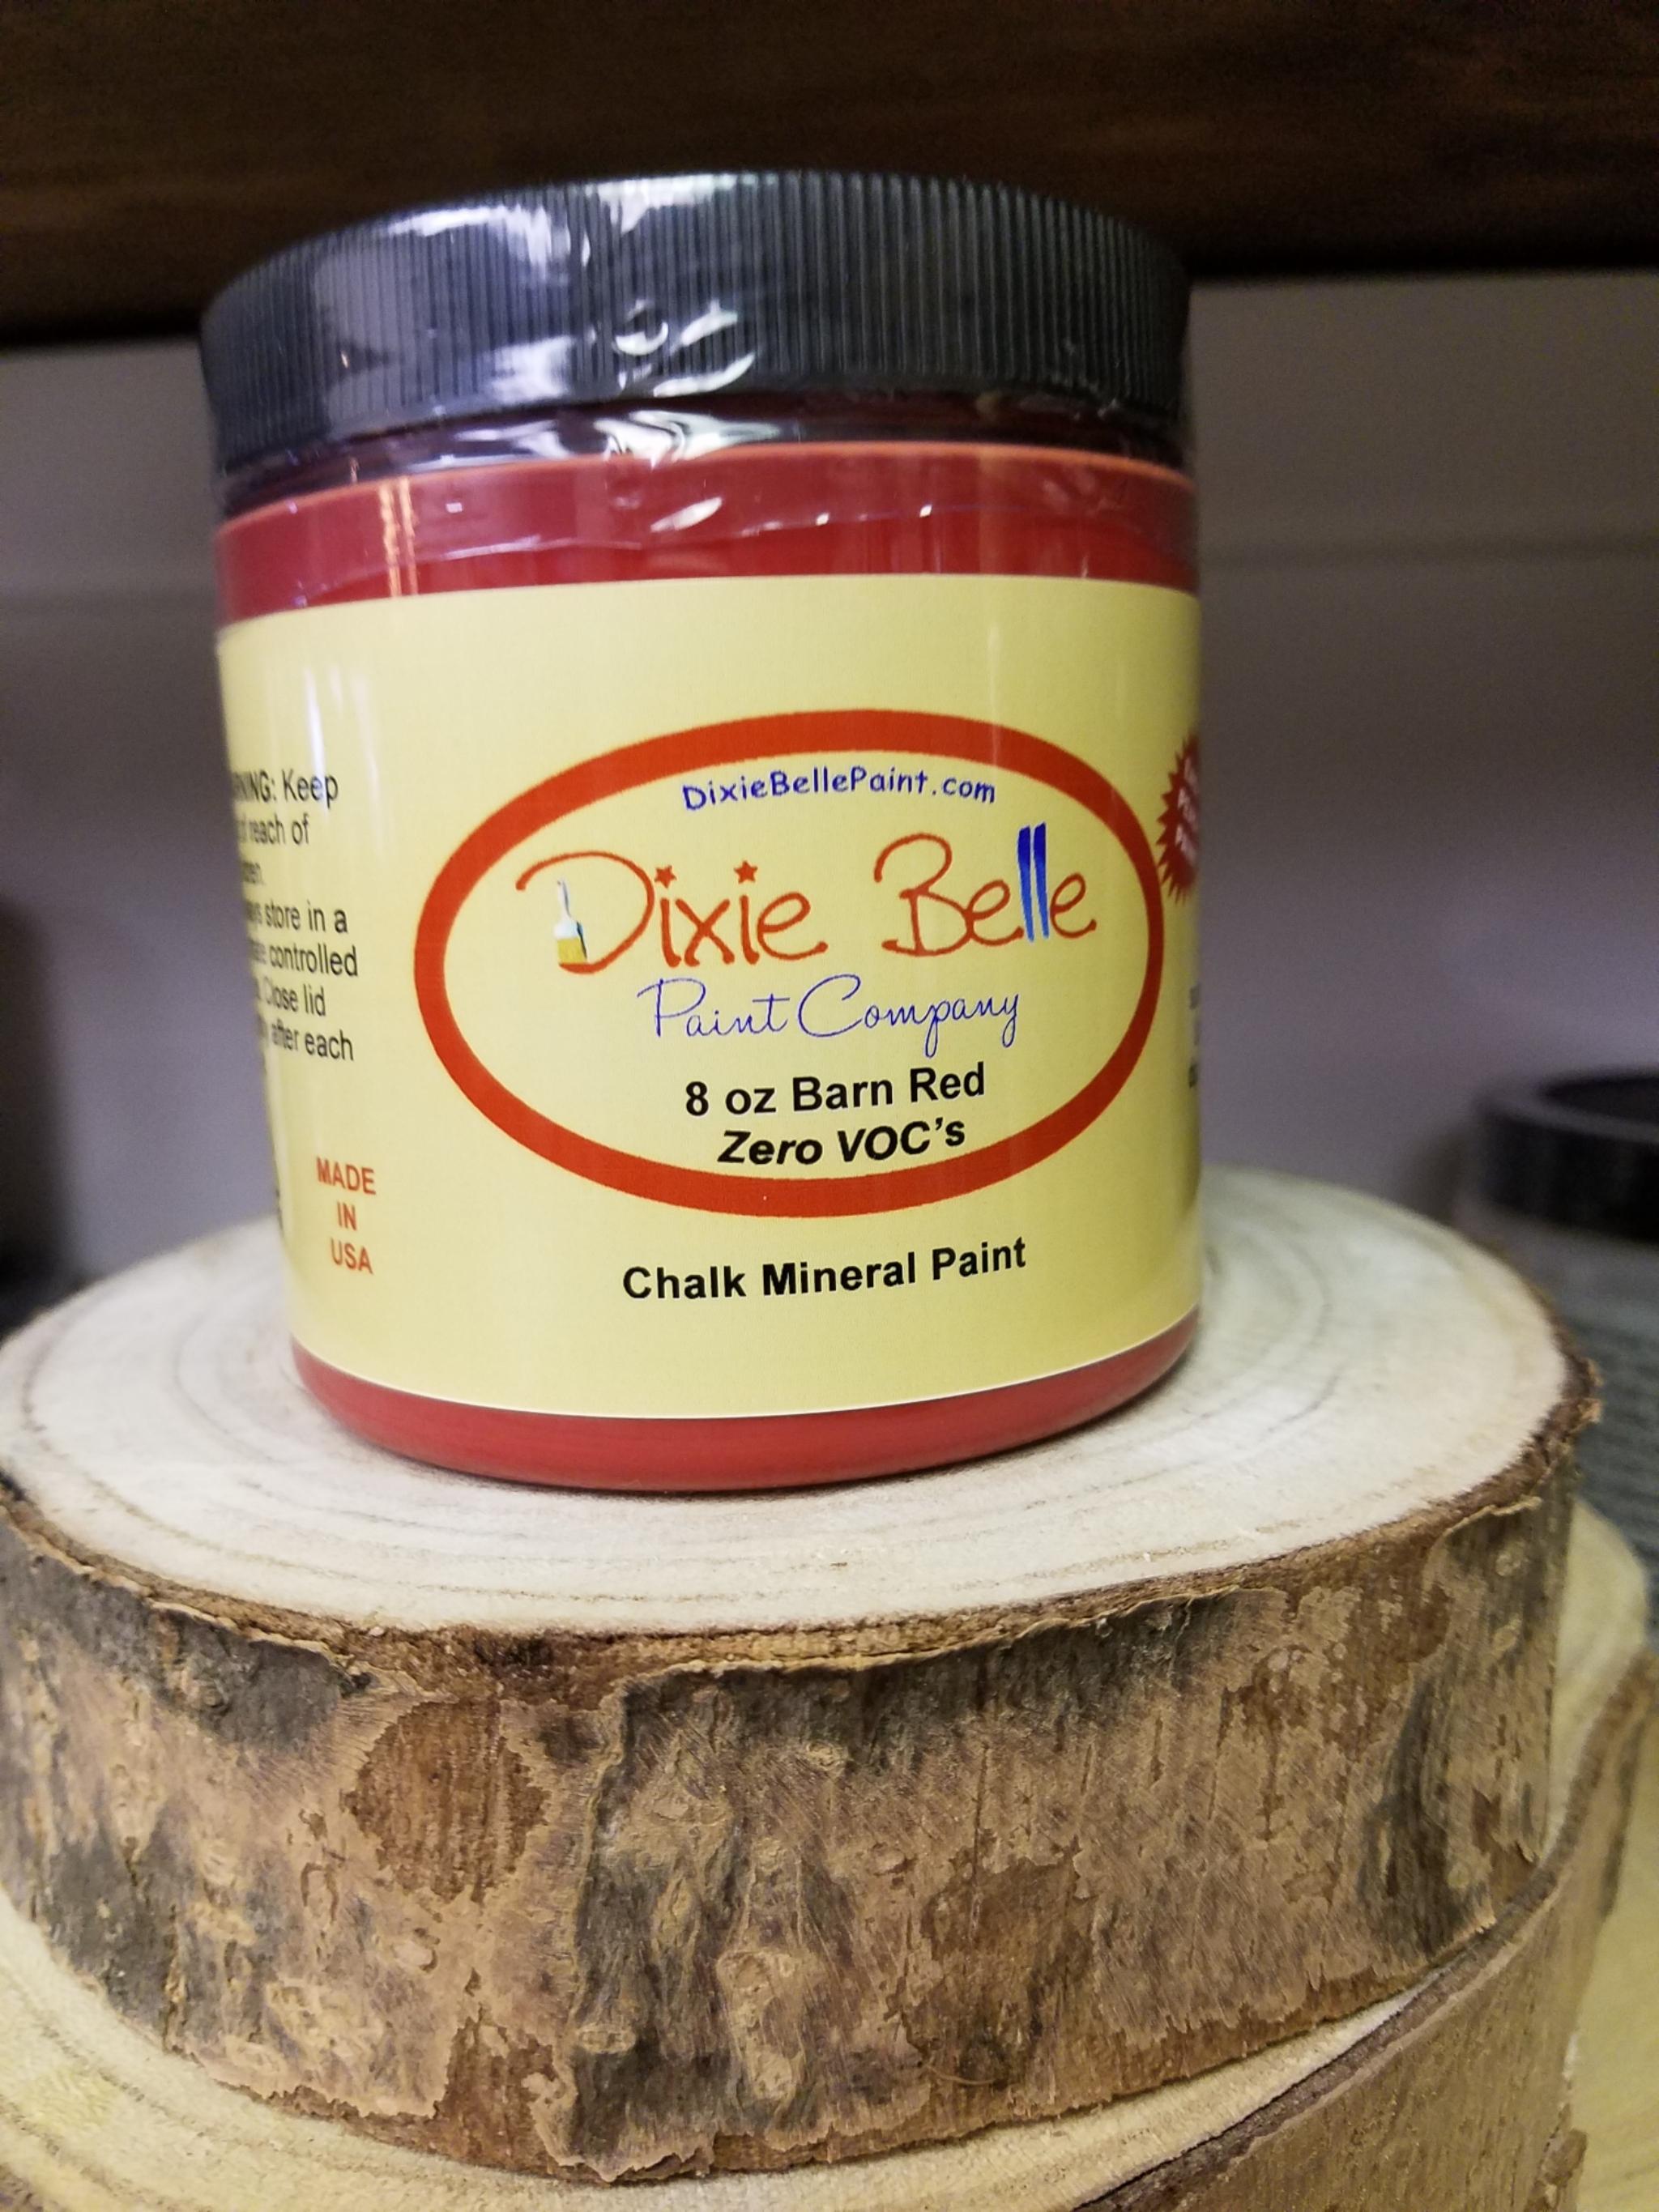 Dixie Belle Barn Red Paint 8oz 815146020009